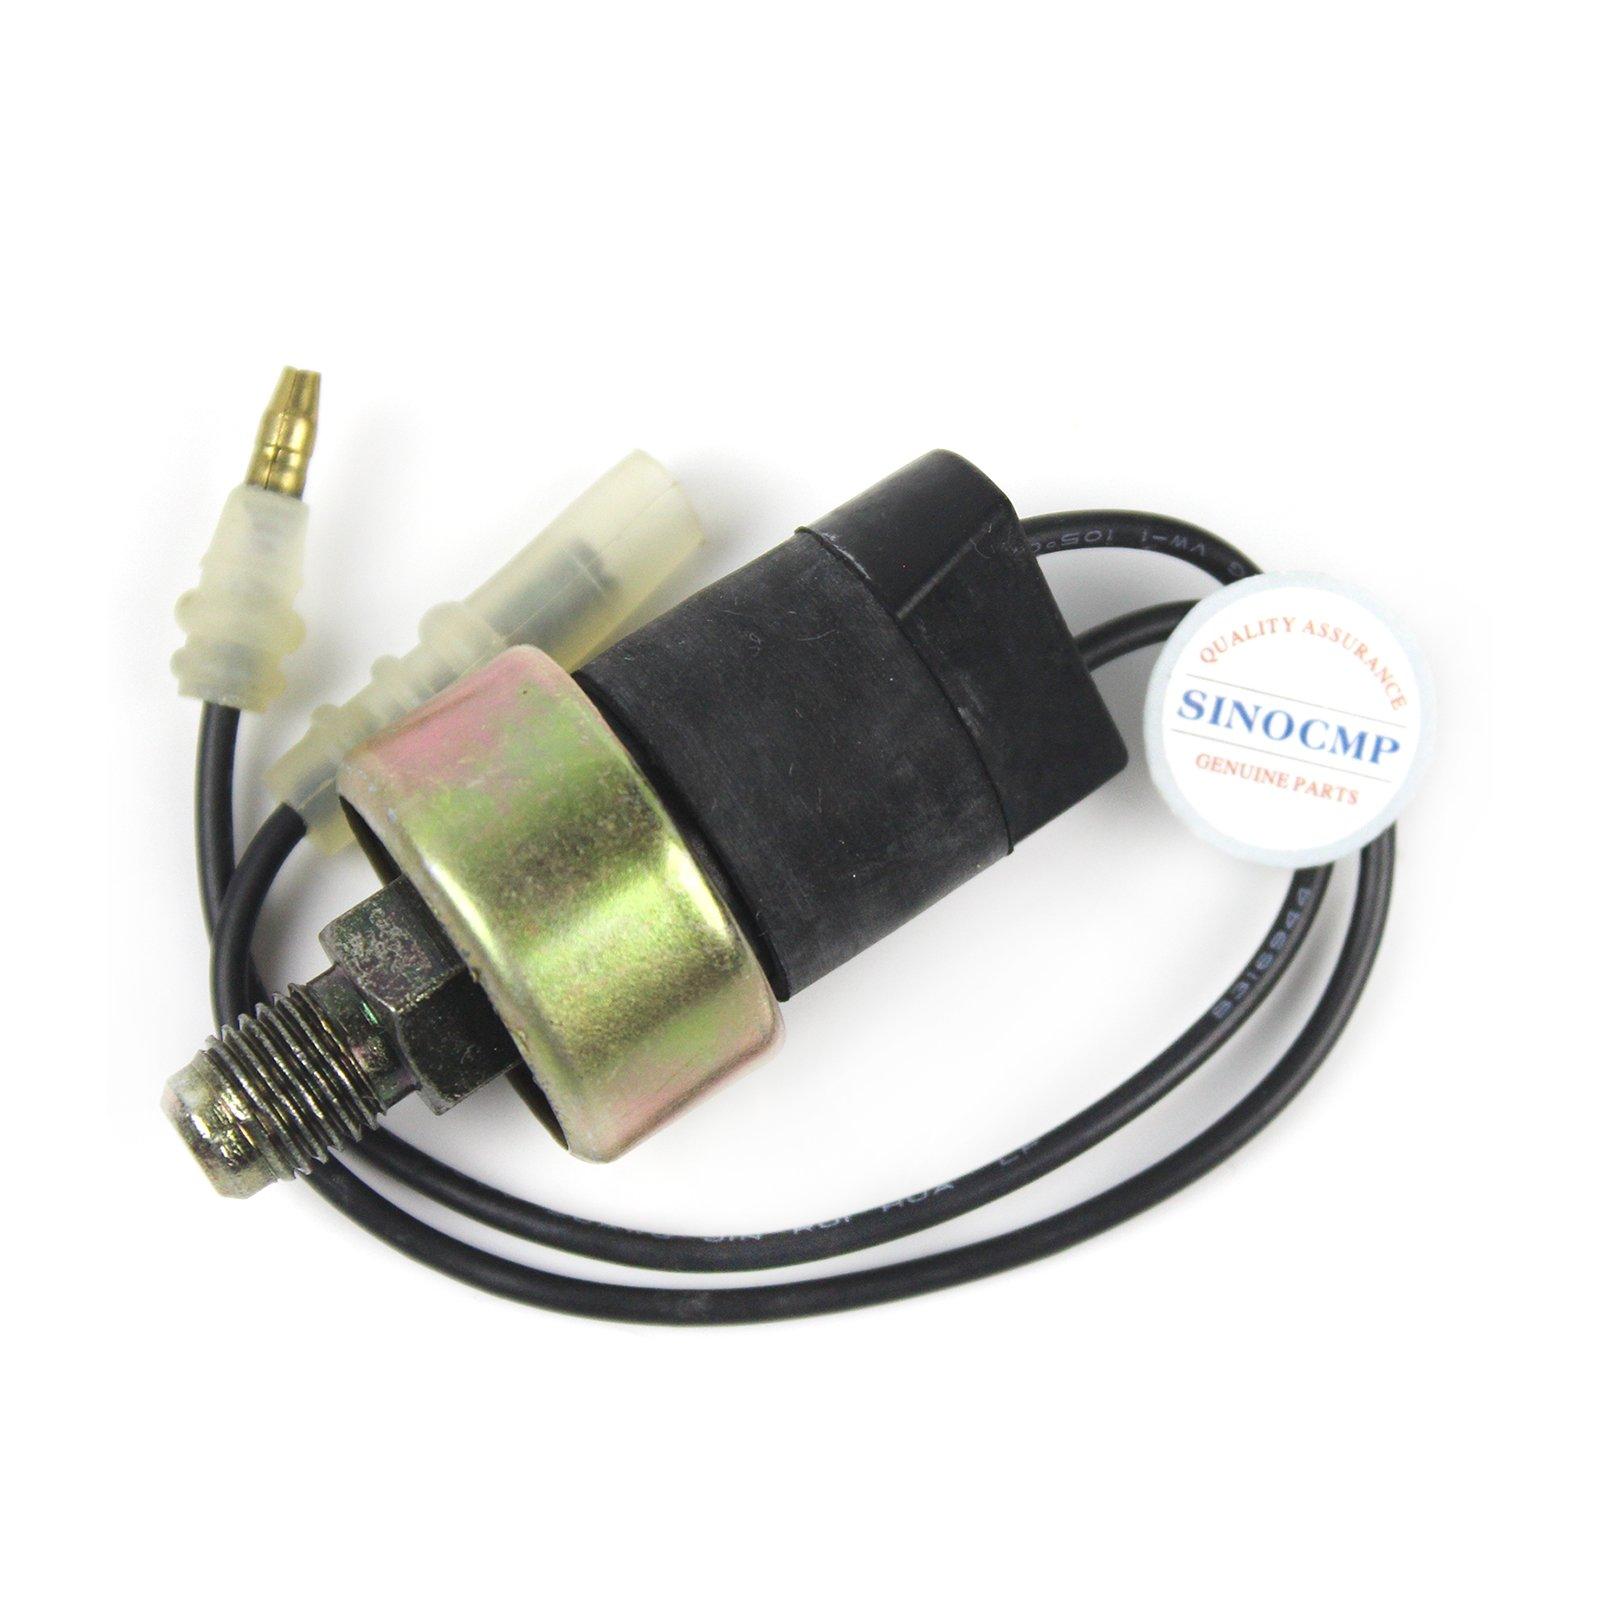 4259333 Pressure Sensor - SINOCMP Excavator Oil Pressure Sensor 4259333 for Hitachi Excavator Parts EX200-2 EX200-3 EX300-3 Parts, 3 Month Warranty